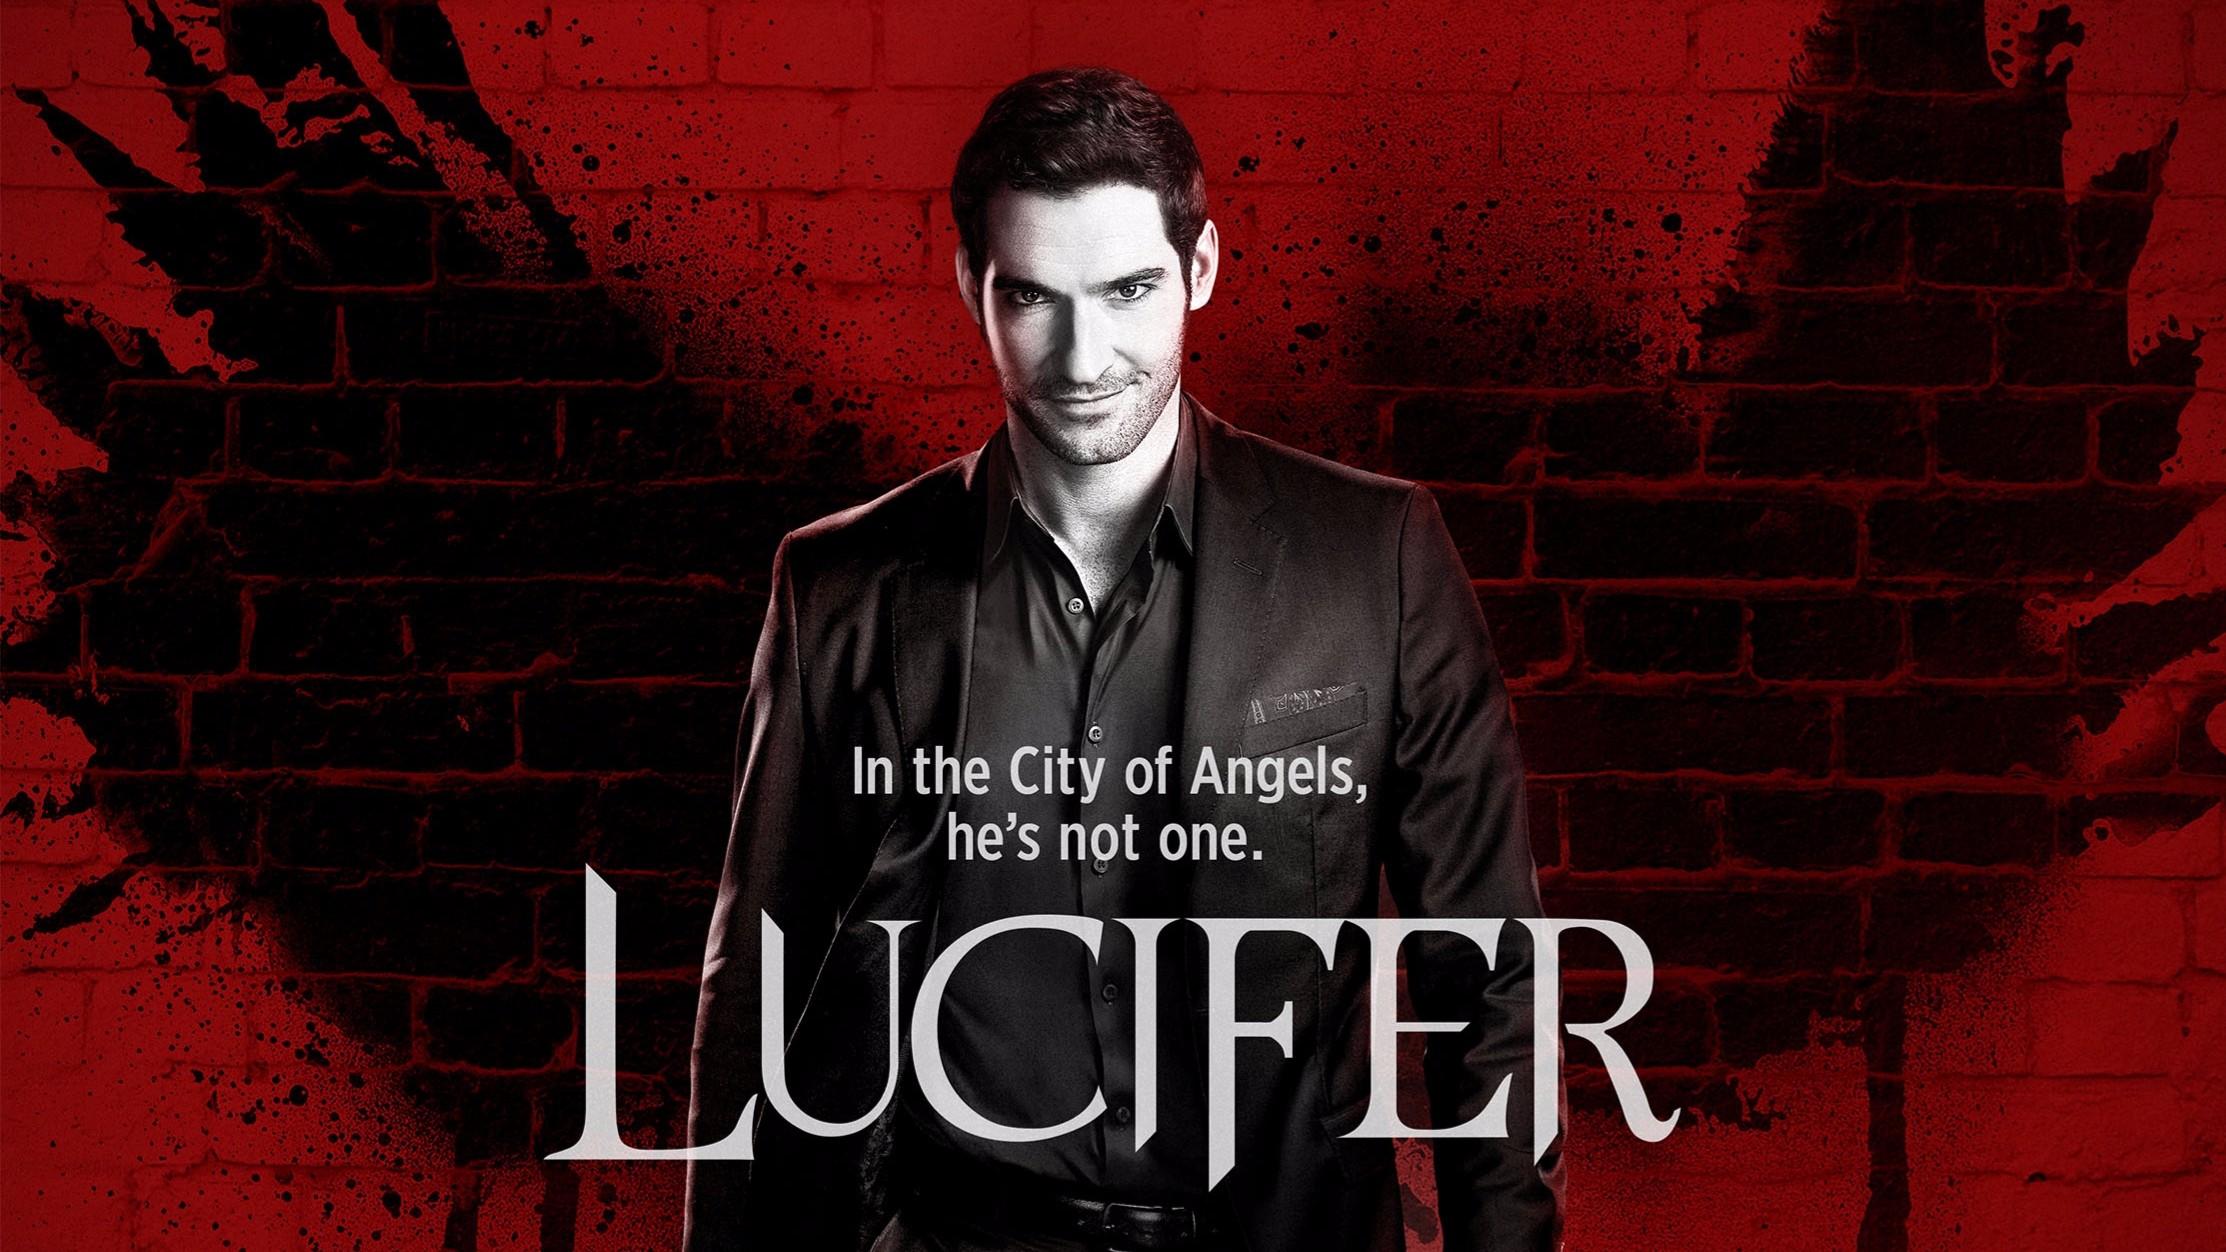 S2 promo Lucifer city of angels.jpg